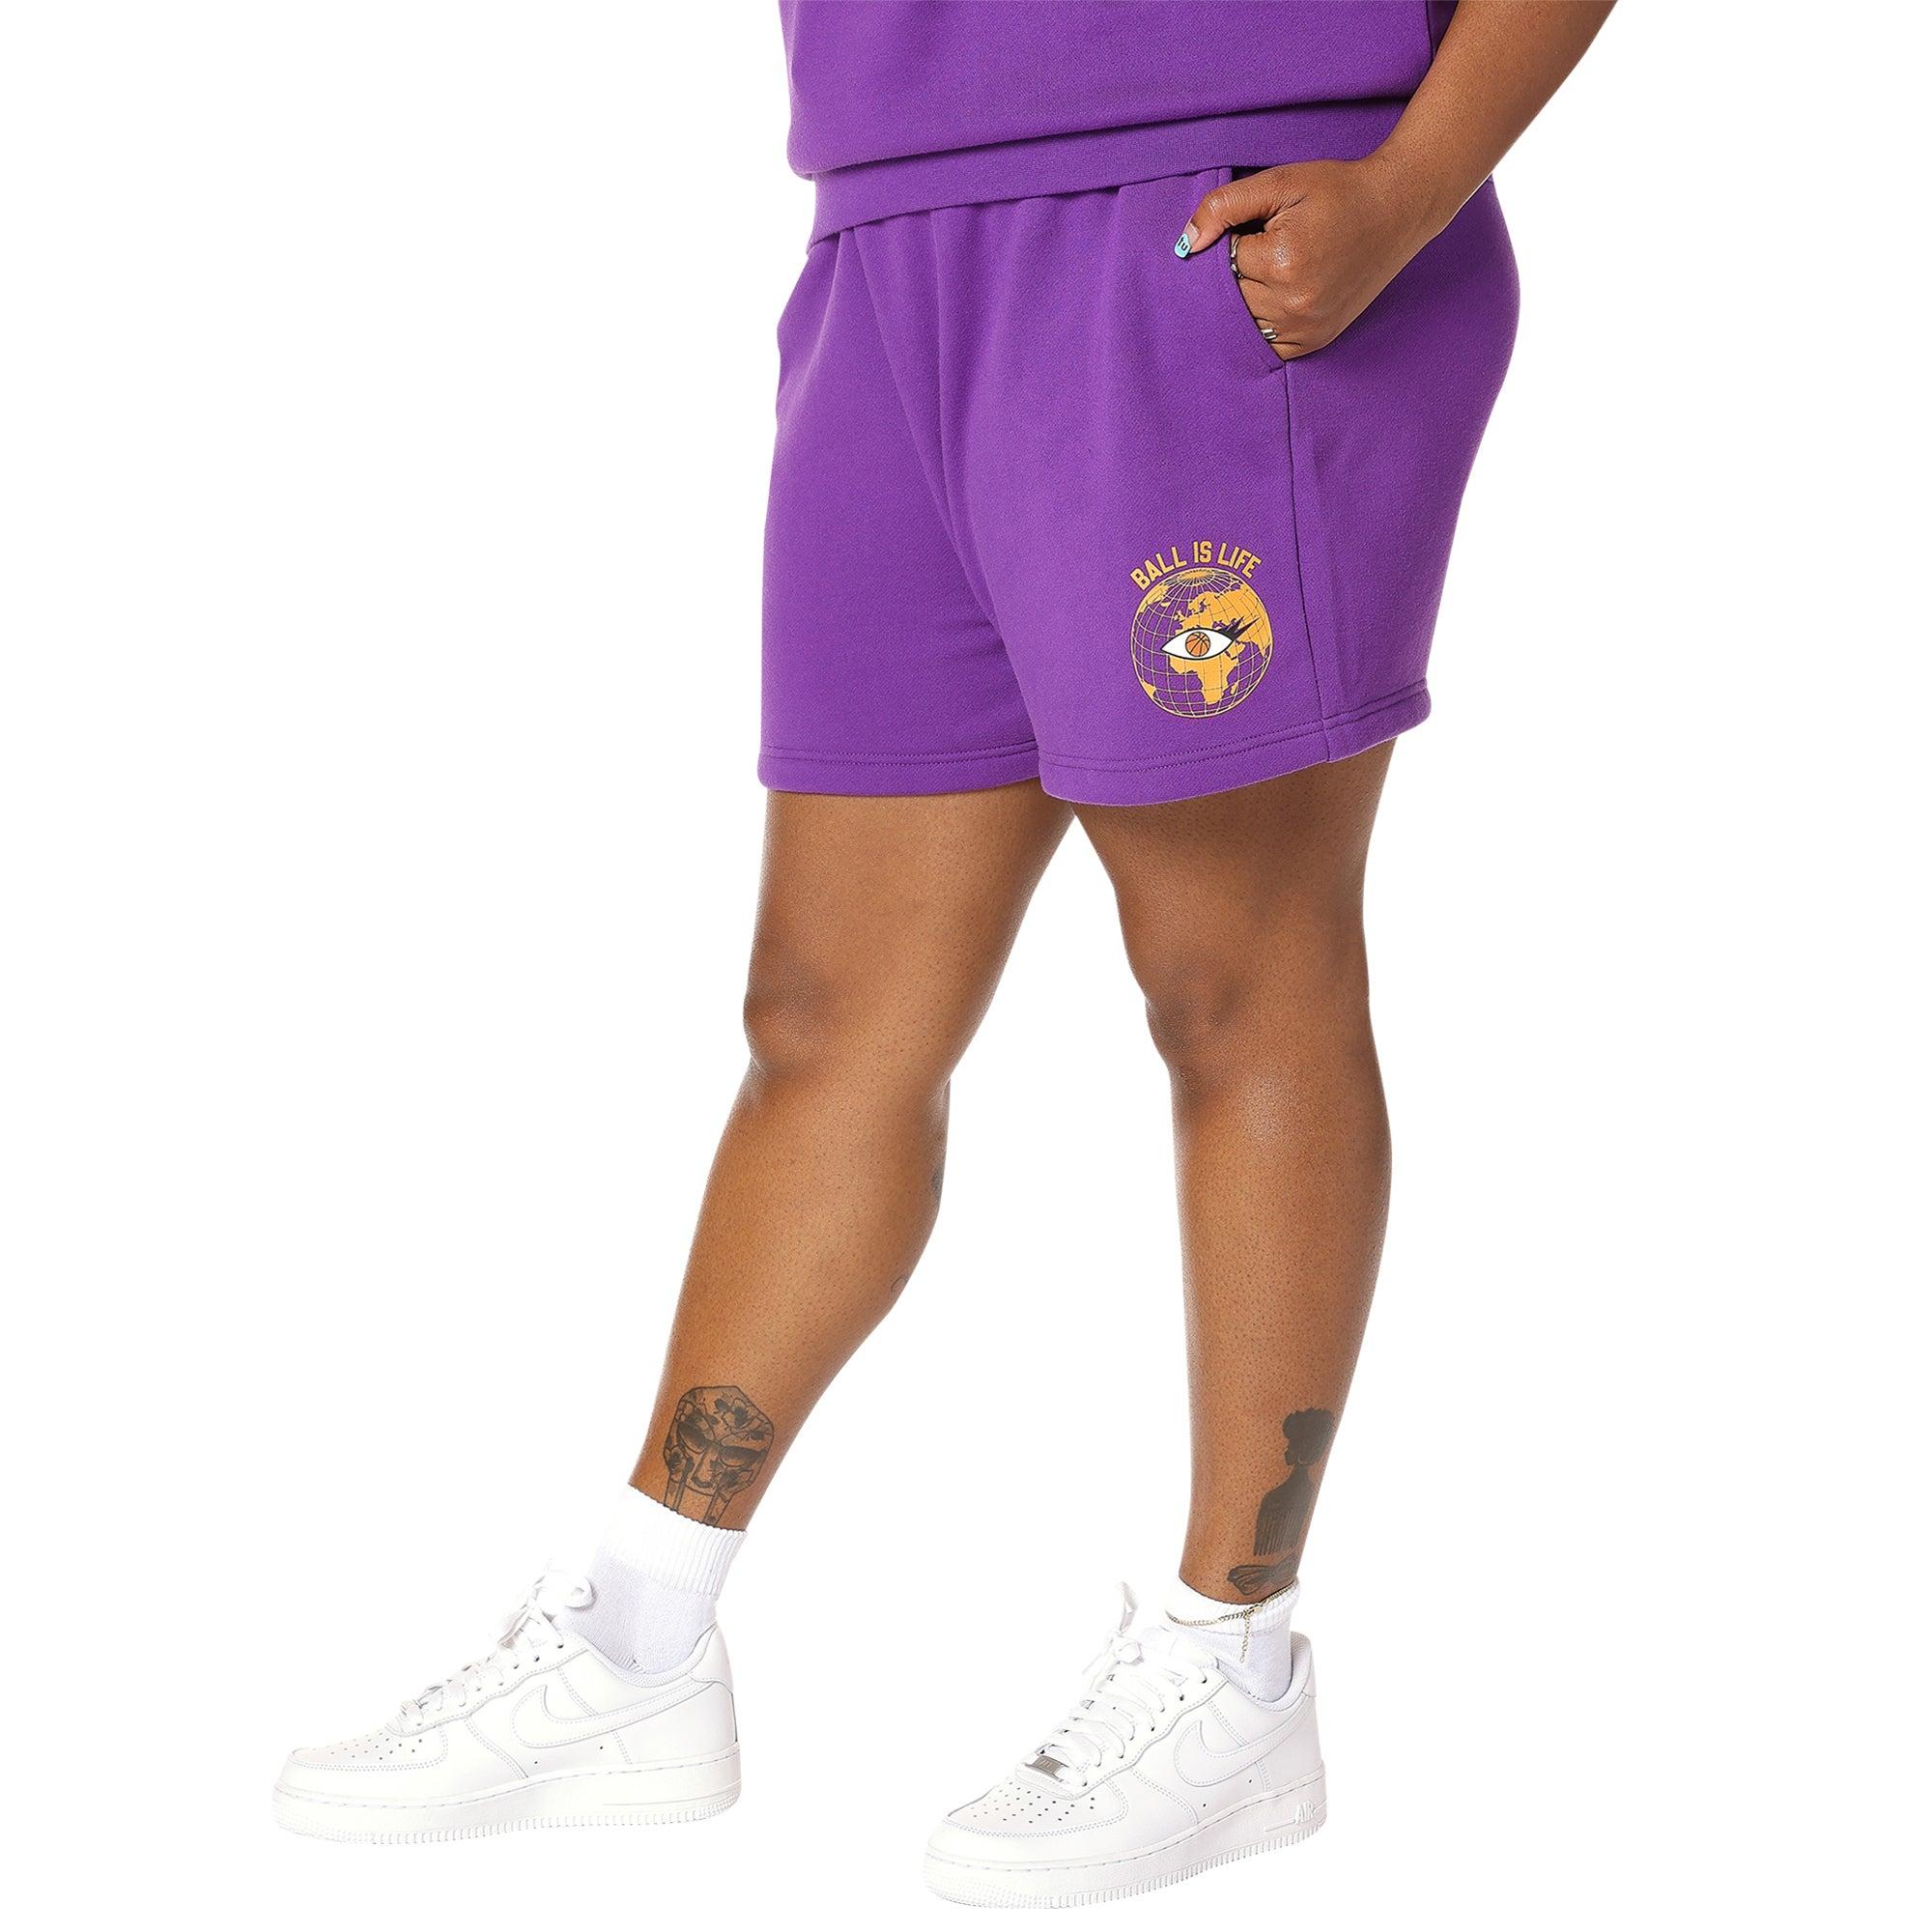 Melody Ehsani Fleece Basketball Shorts